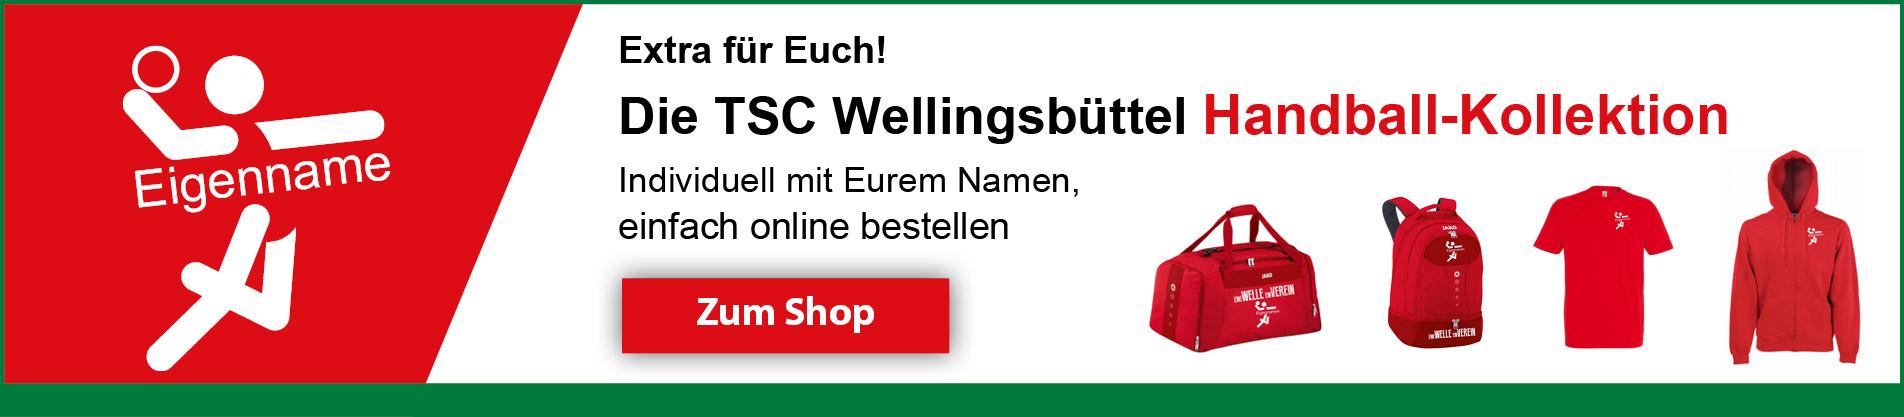 TSC Wellingsbüttel Handball-Kollektion Banner